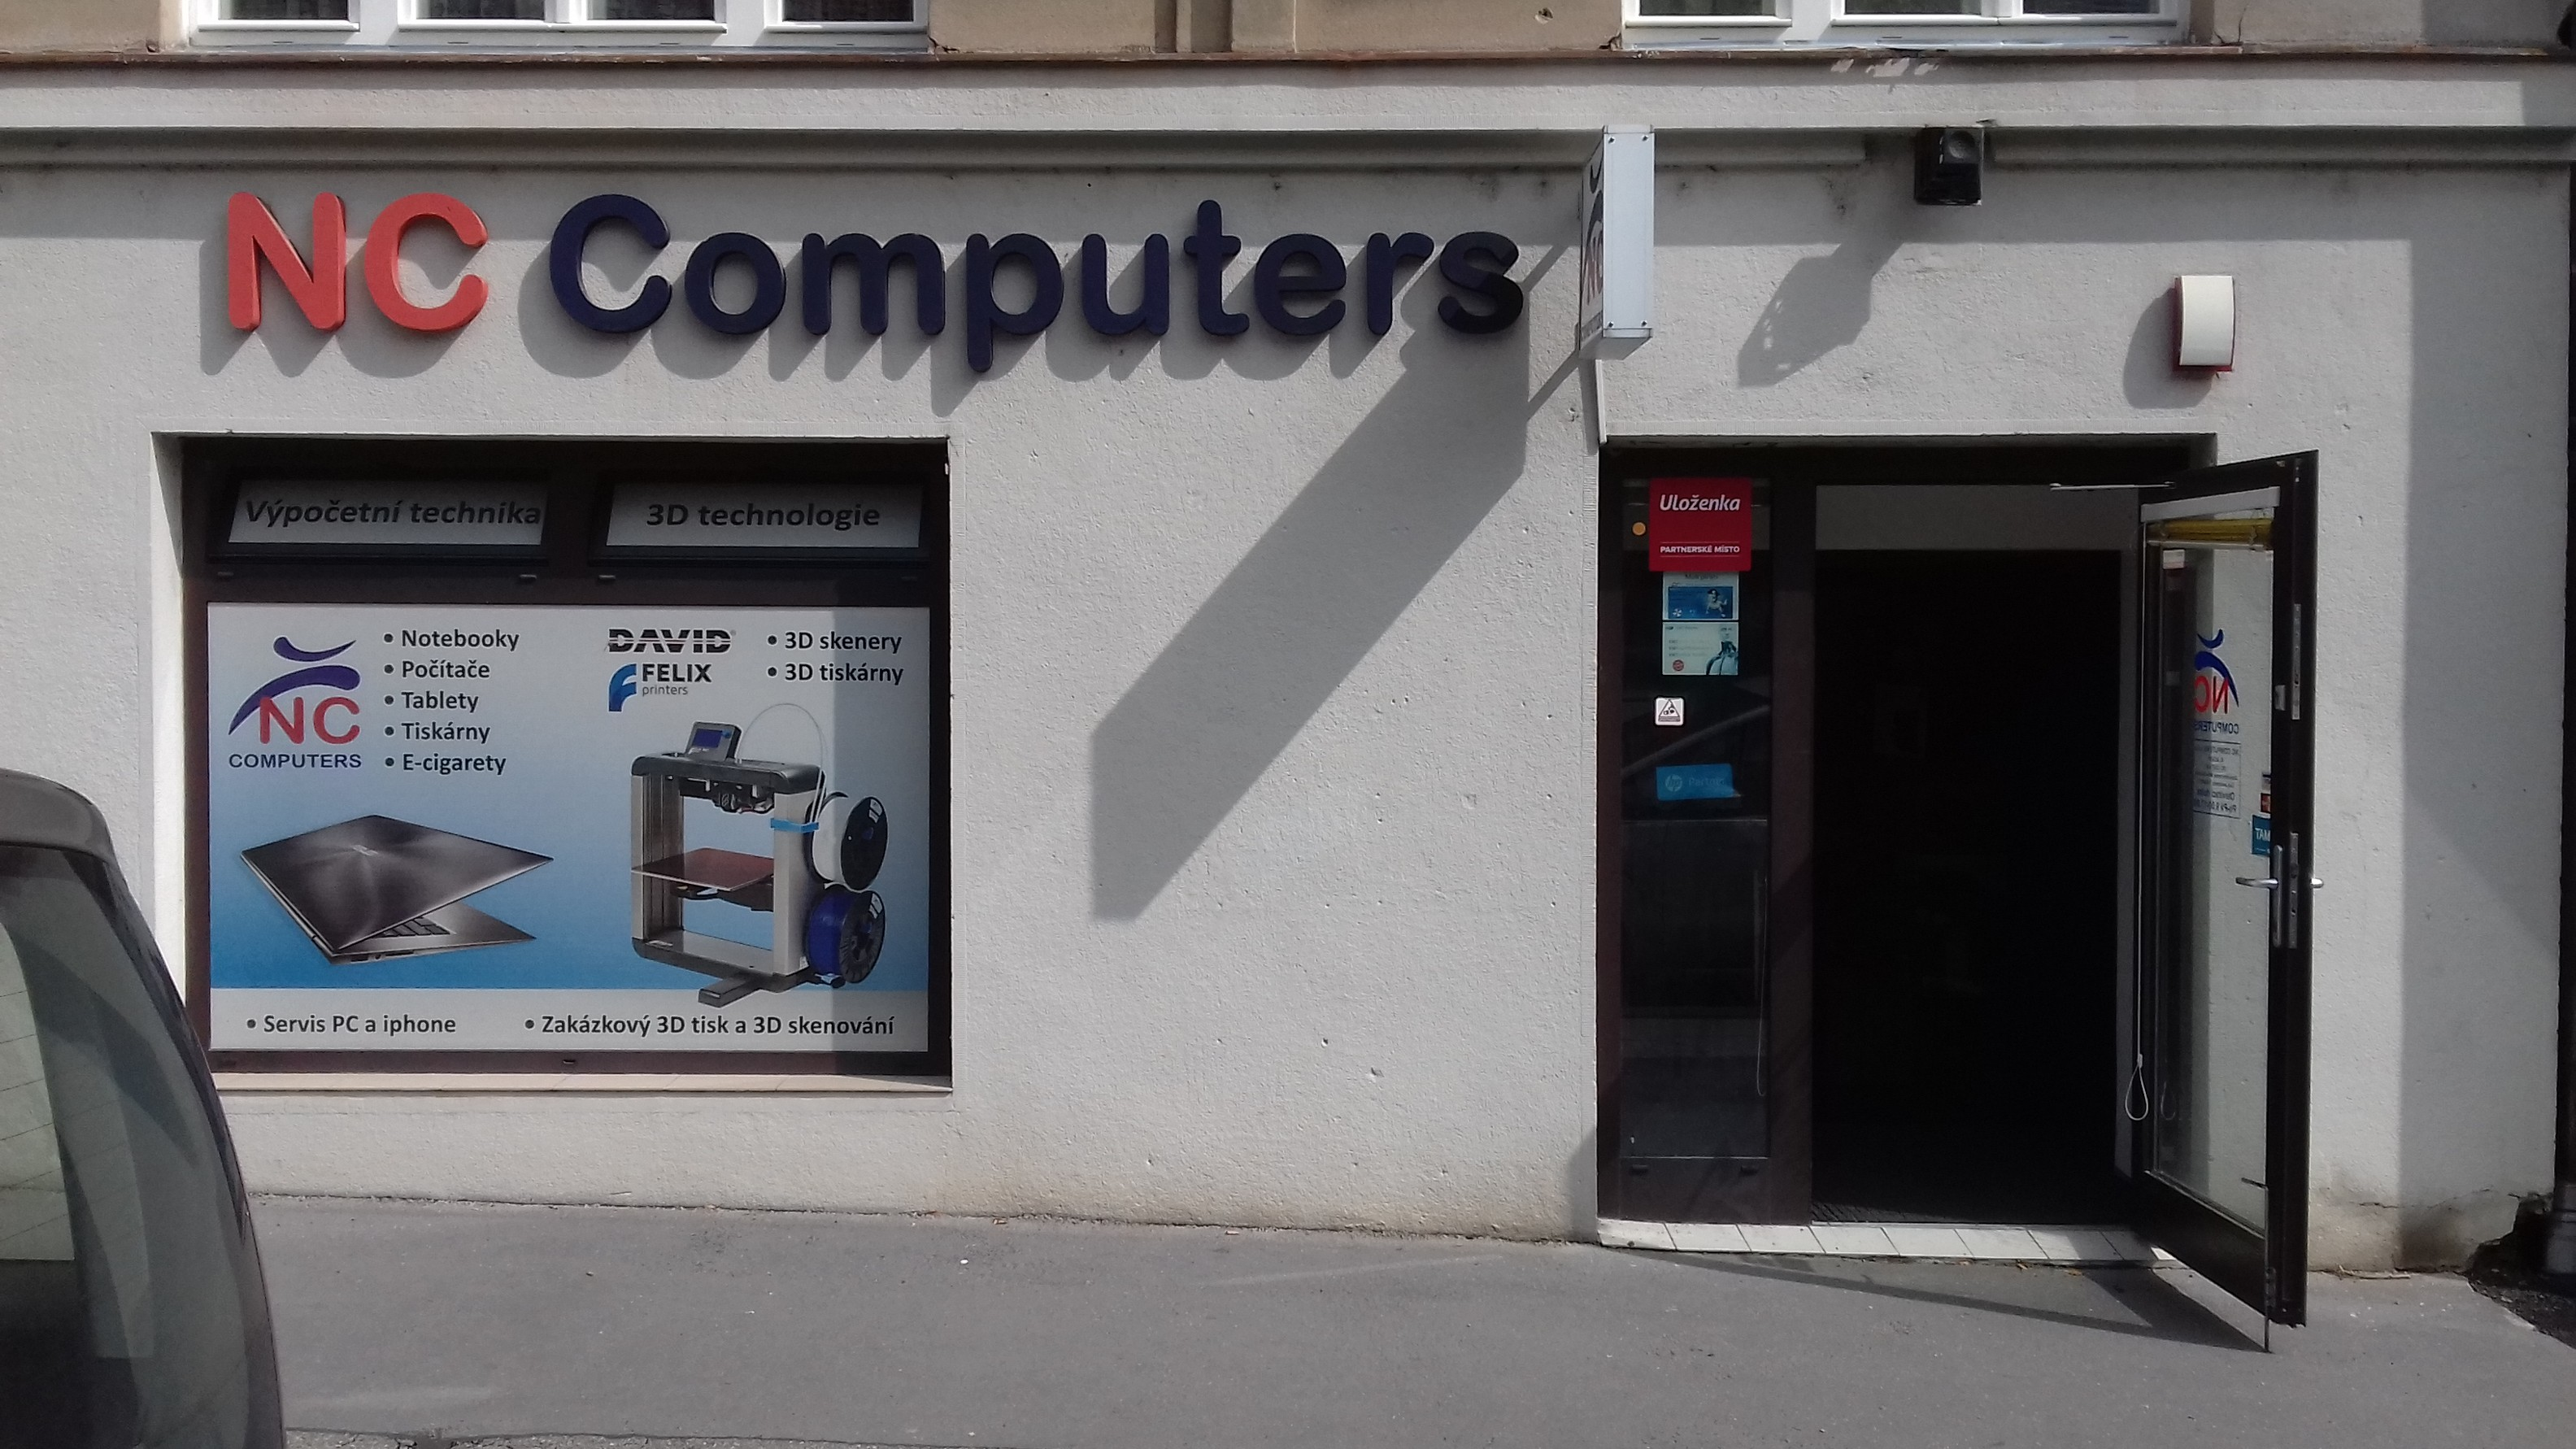 Pobočka Praha 6, Nikoly Tesly 1095/10 (NC Computers)